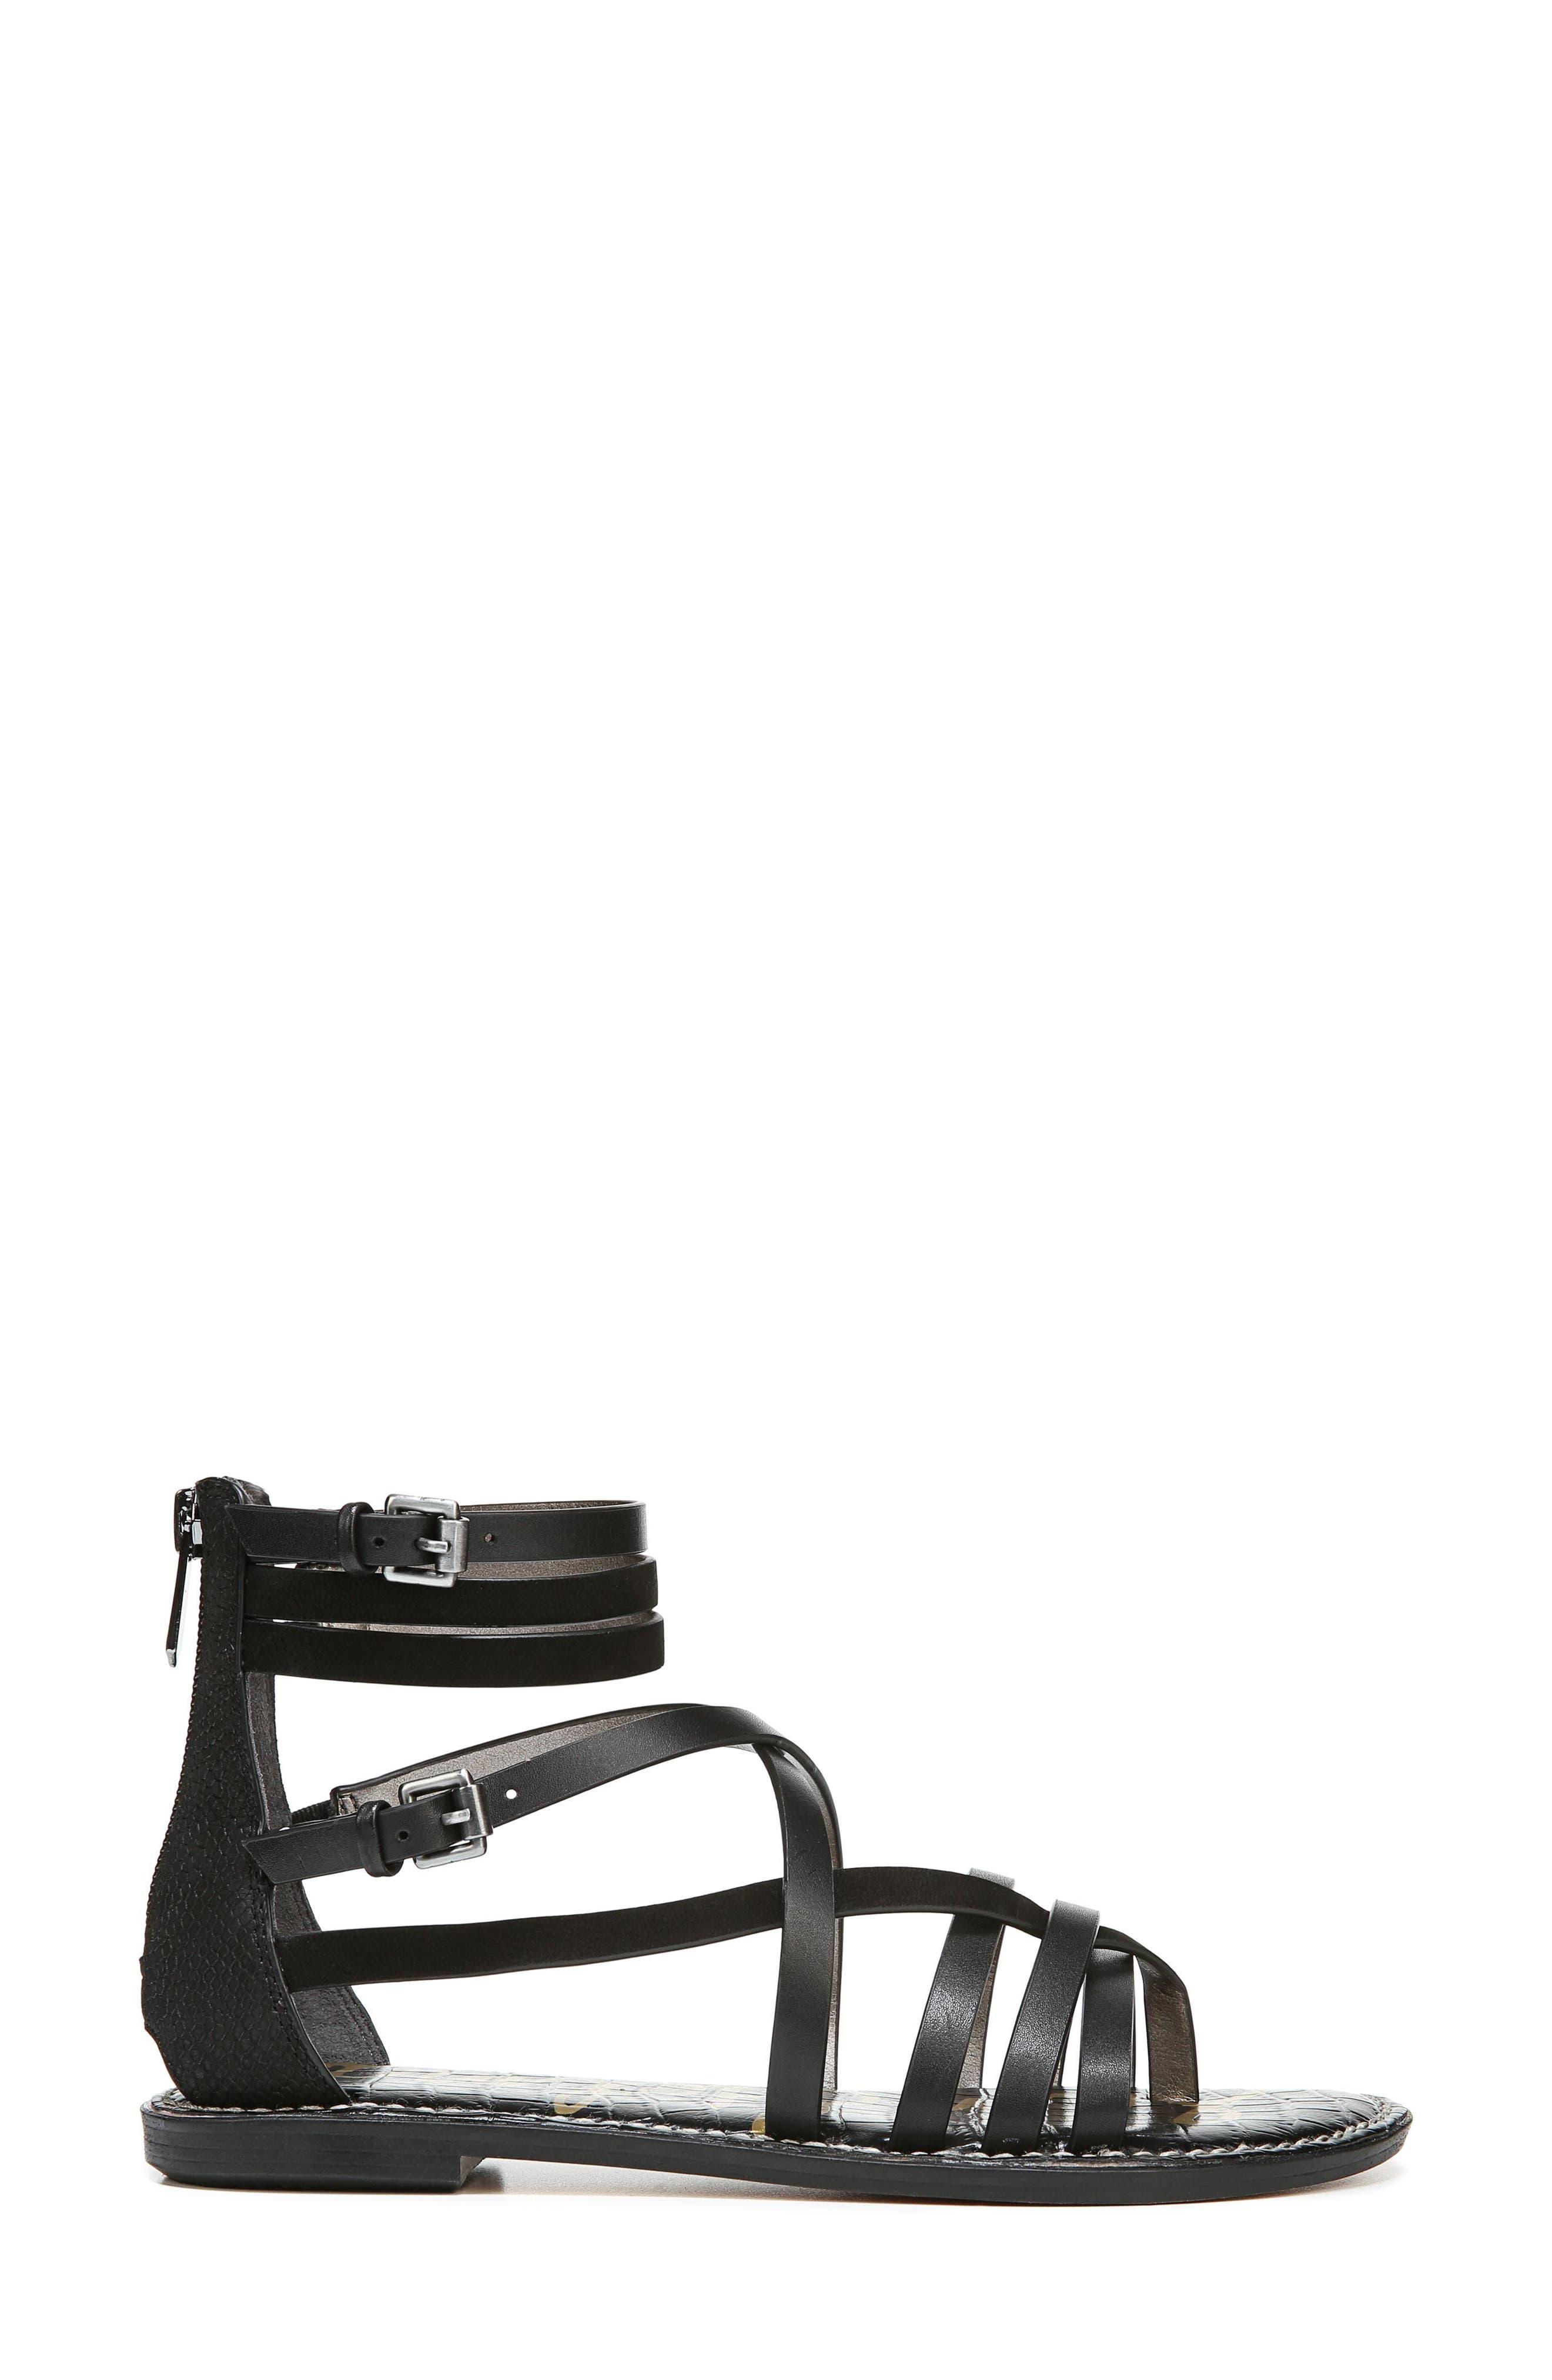 Ganesa Strappy Sandal,                             Alternate thumbnail 3, color,                             BLACK LEATHER